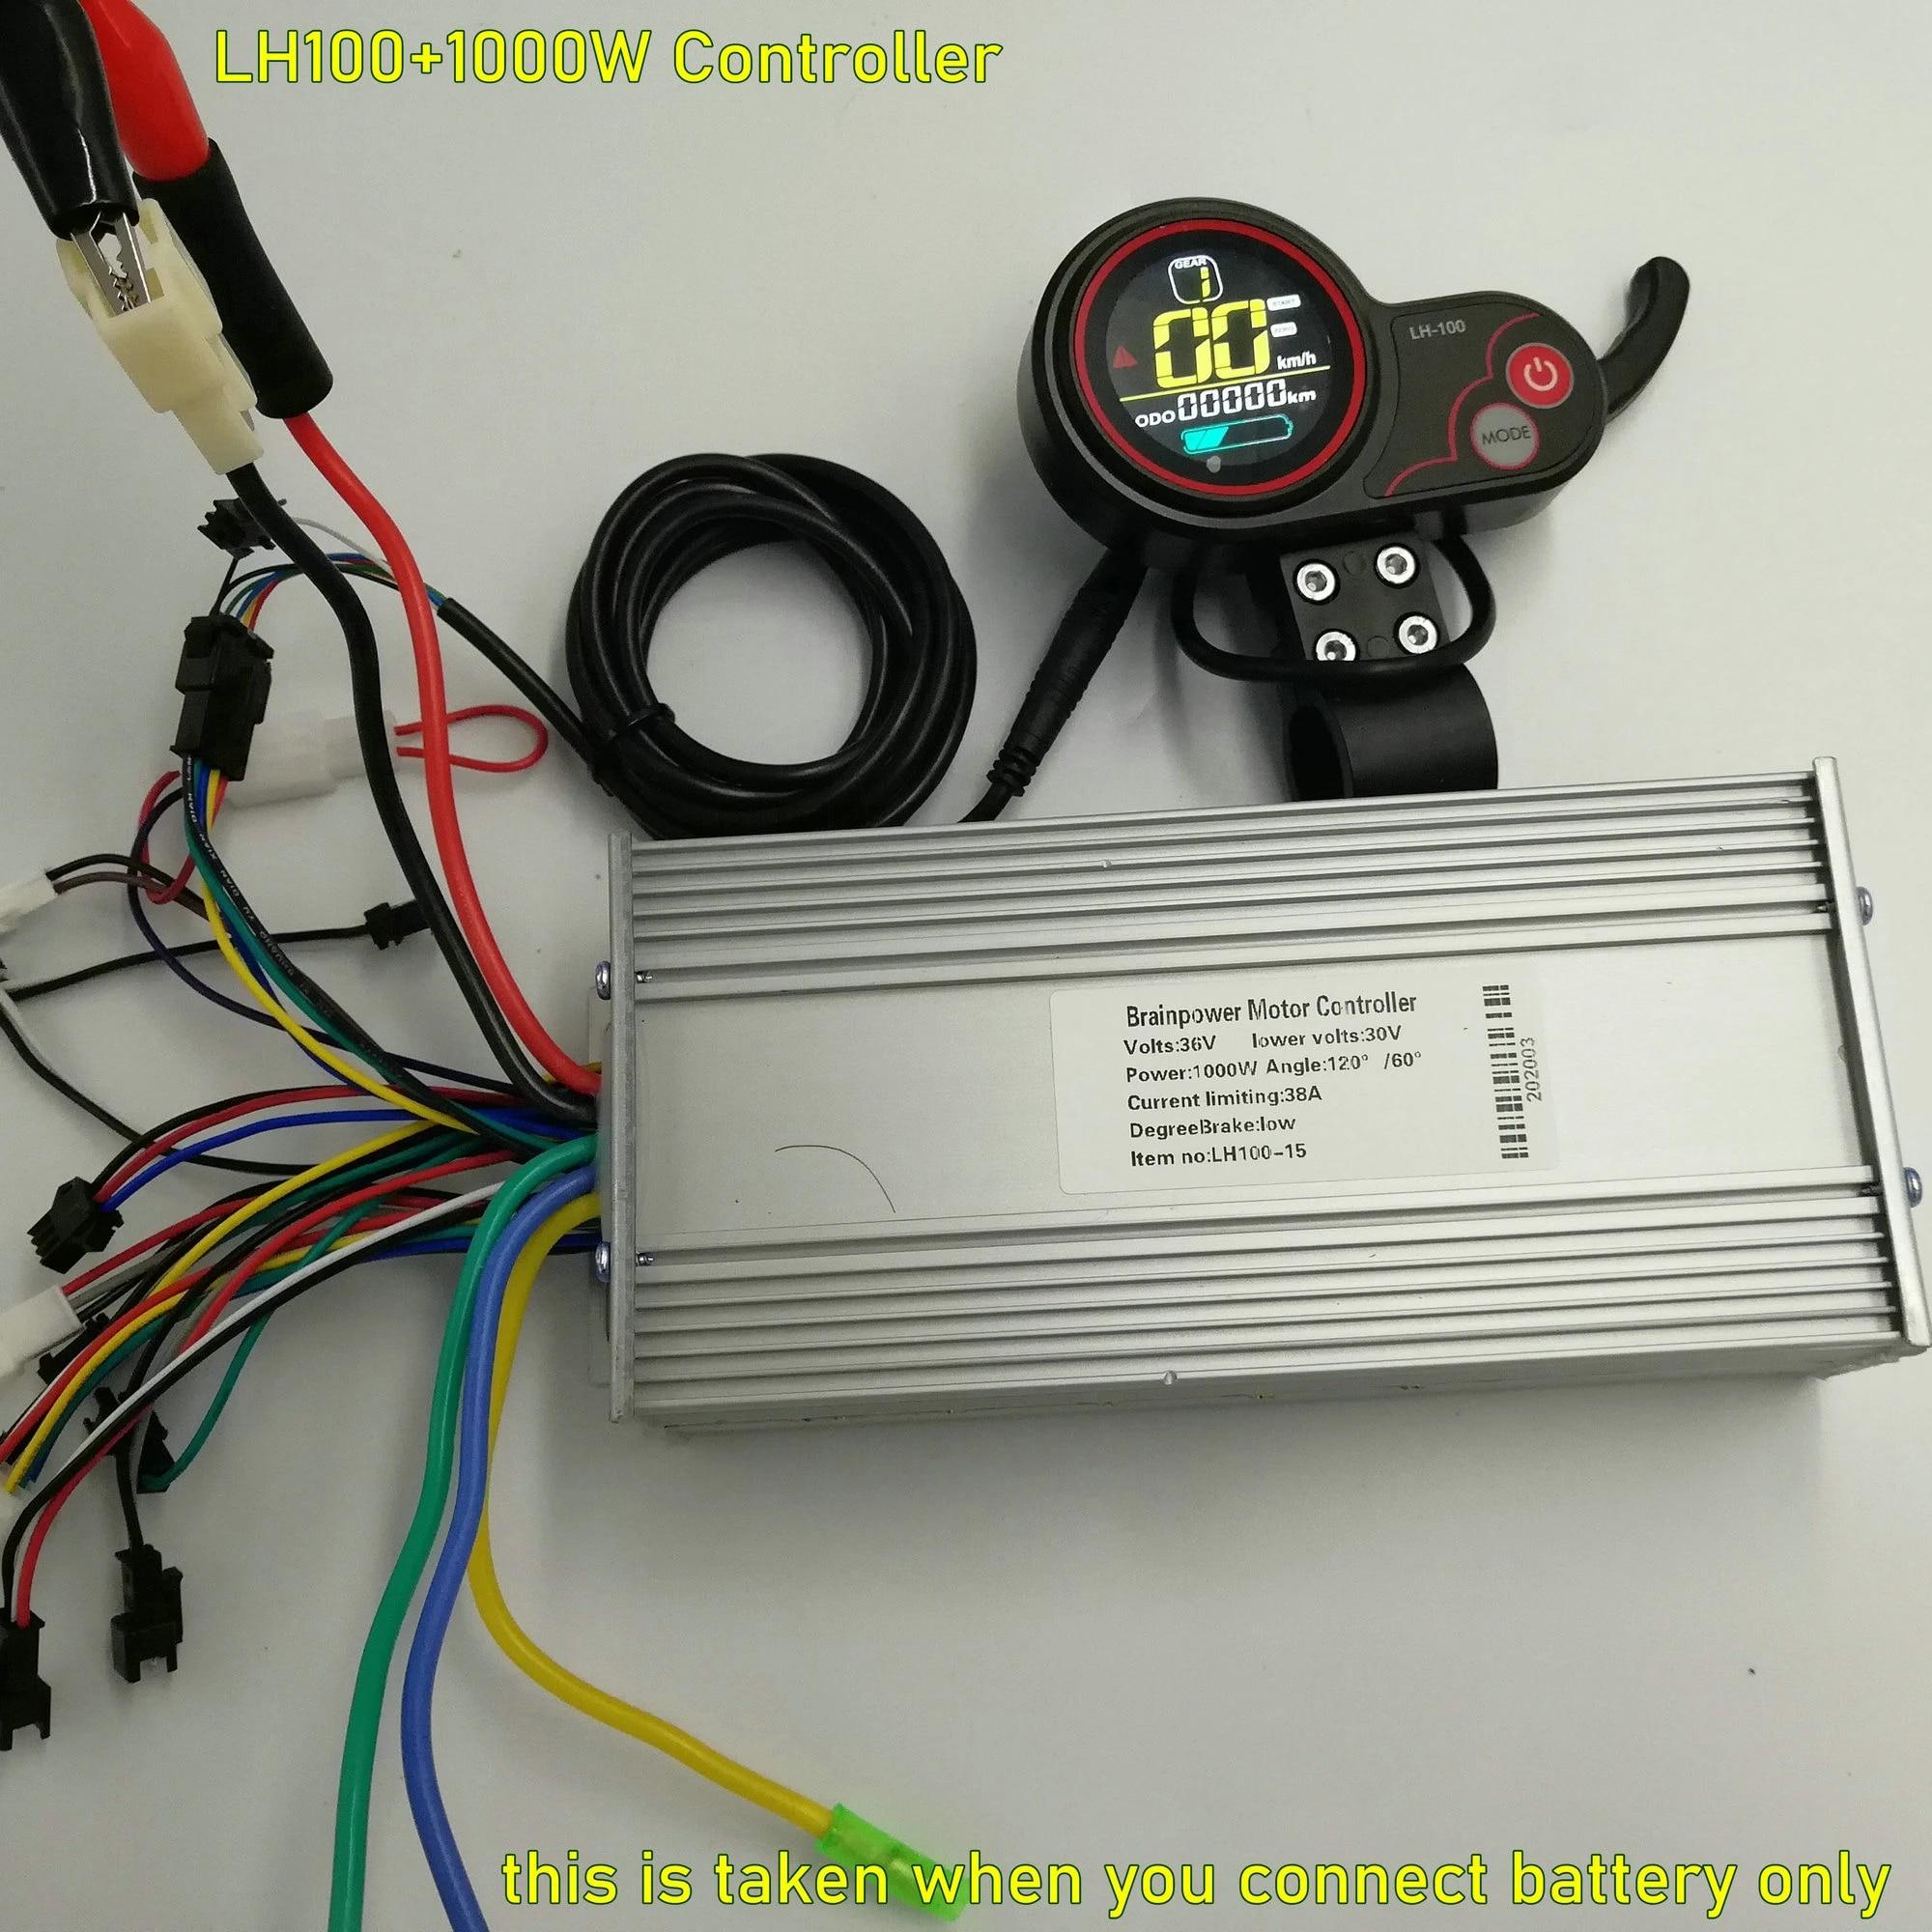 36v48v60v 800w1000w 15 Mosfet Controller+Display LH100 Control Panel  Electric Bike MTB SKATEBOARD Instrument ScooterParts|electric panel parts| control panelcontroller control - AliExpressAliExpress